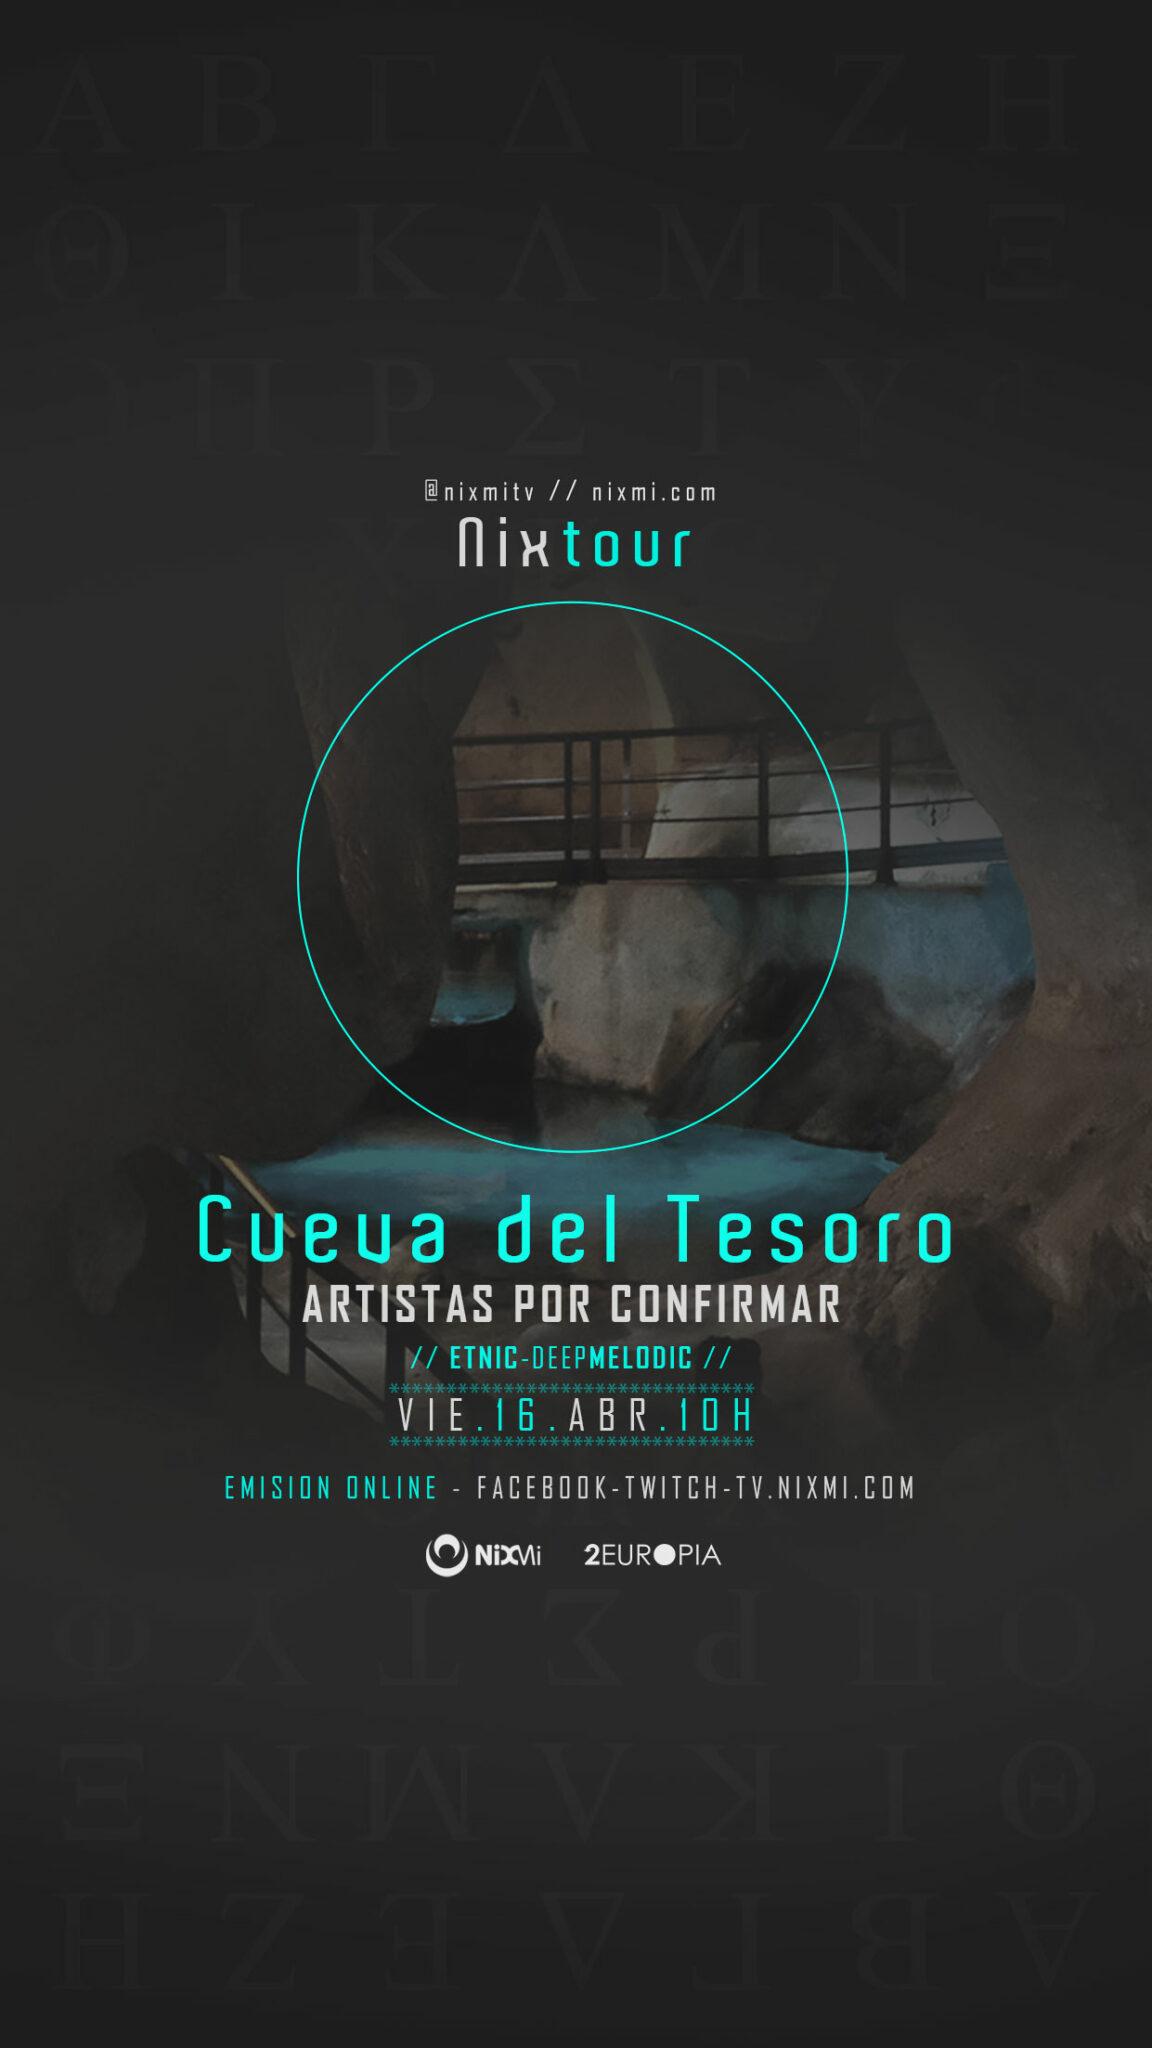 2021-04-16—nixtour-Cueva-del-Tesoro